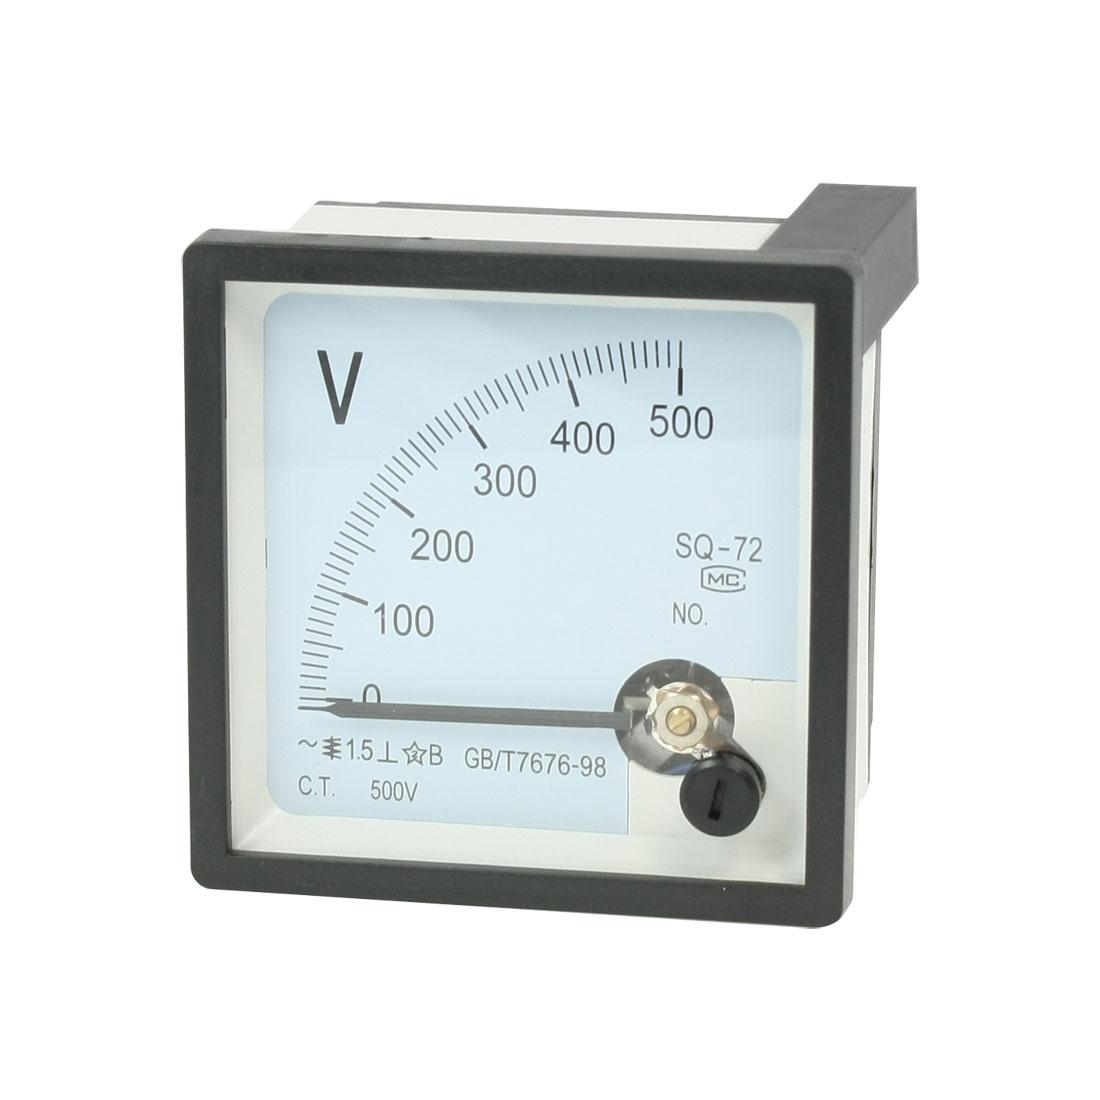 AC 0-500V Fine Tuning Square Plastic Case Analog Voltage Meter Voltmeter